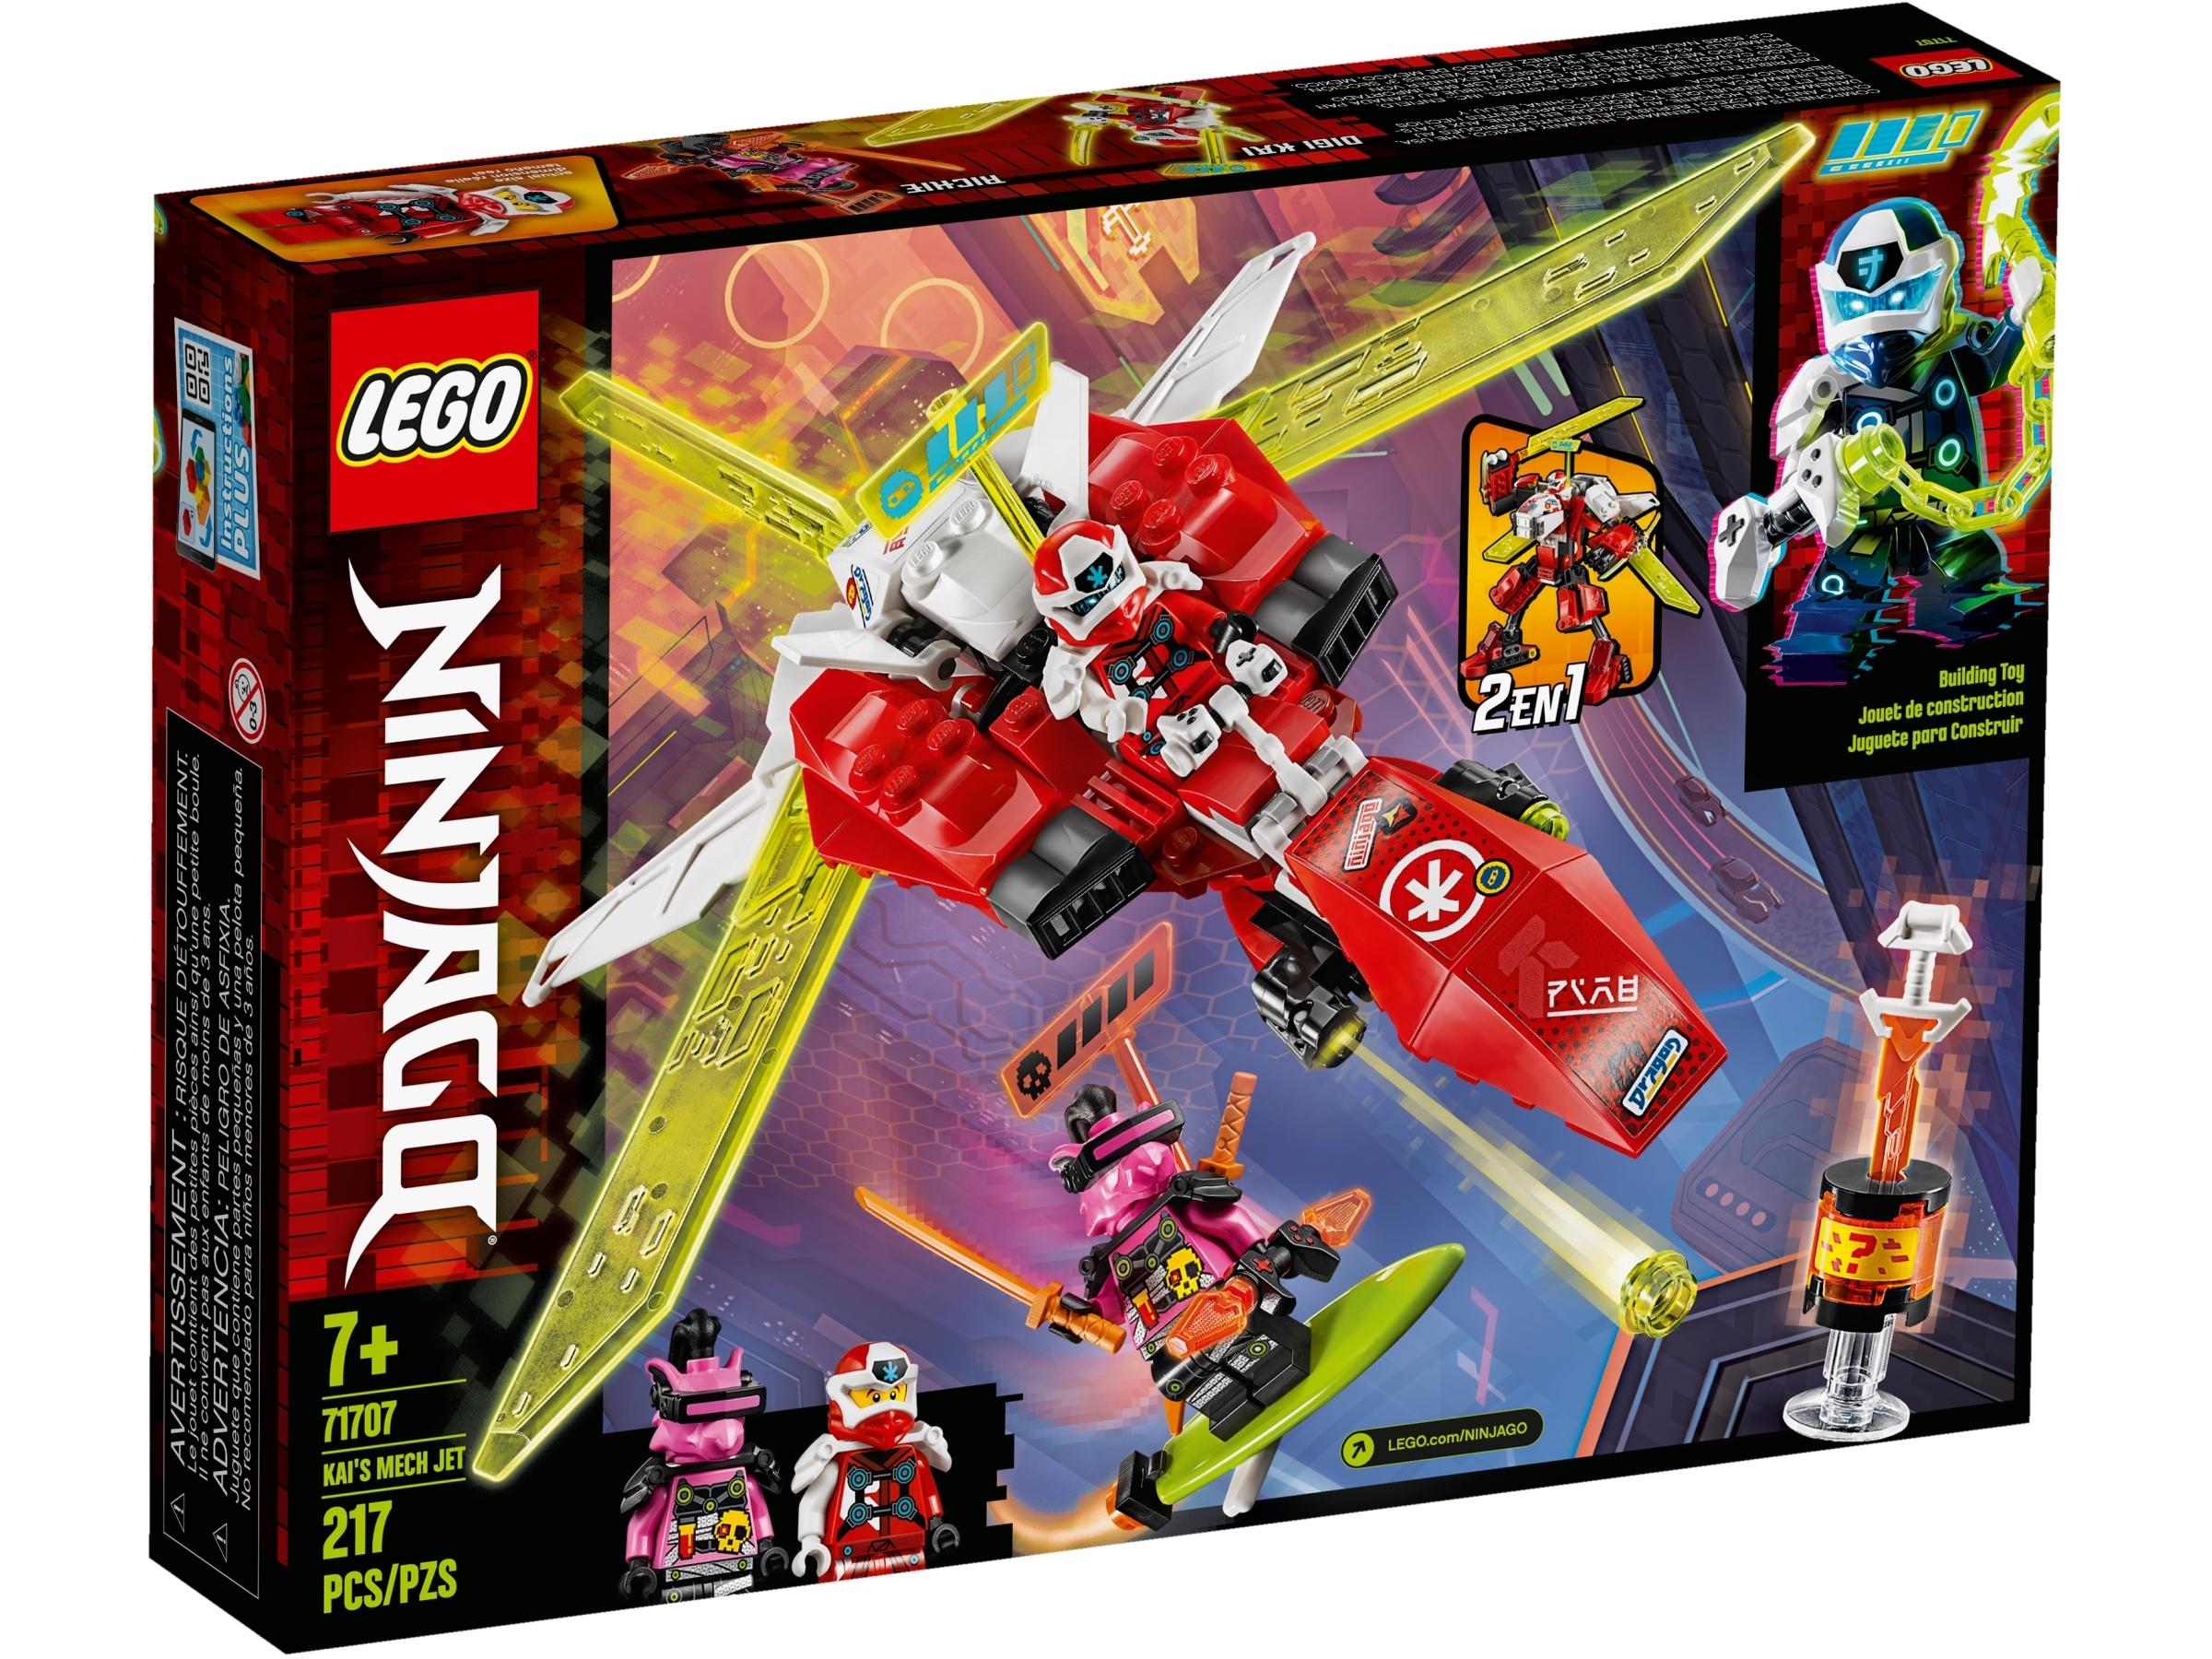 Kai S Mech Jet 71707 Ninjago Buy Online At The Official Lego Shop Us